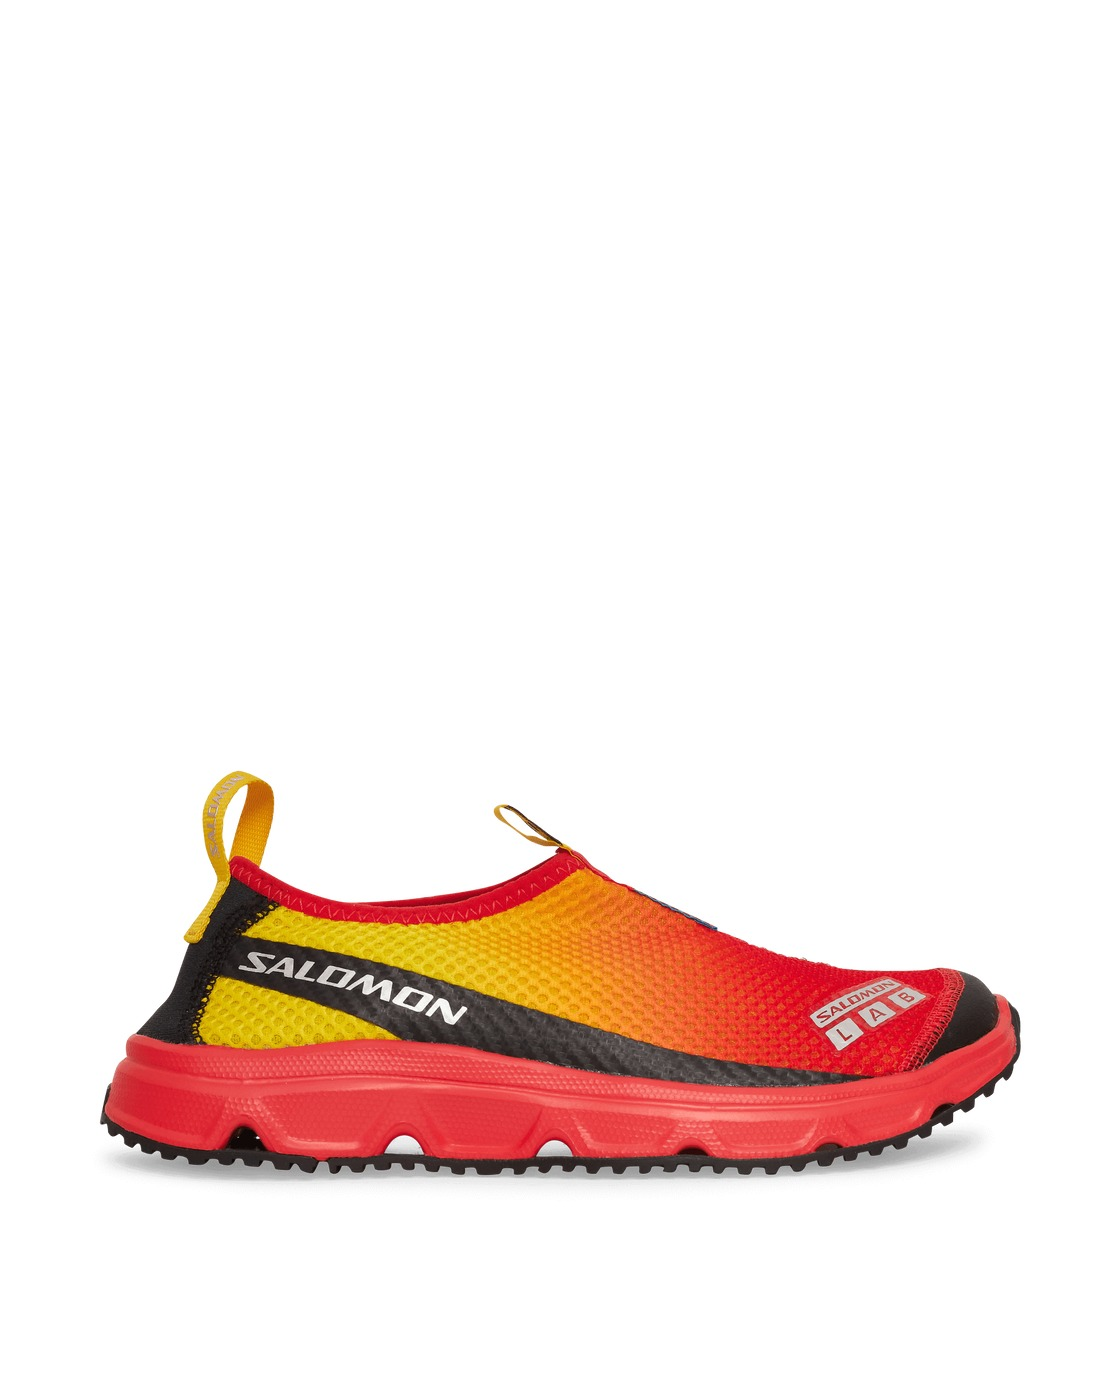 Photo: Salomon Rx Moc 3.0 Advanced Sneakers Lemon/Racing Red